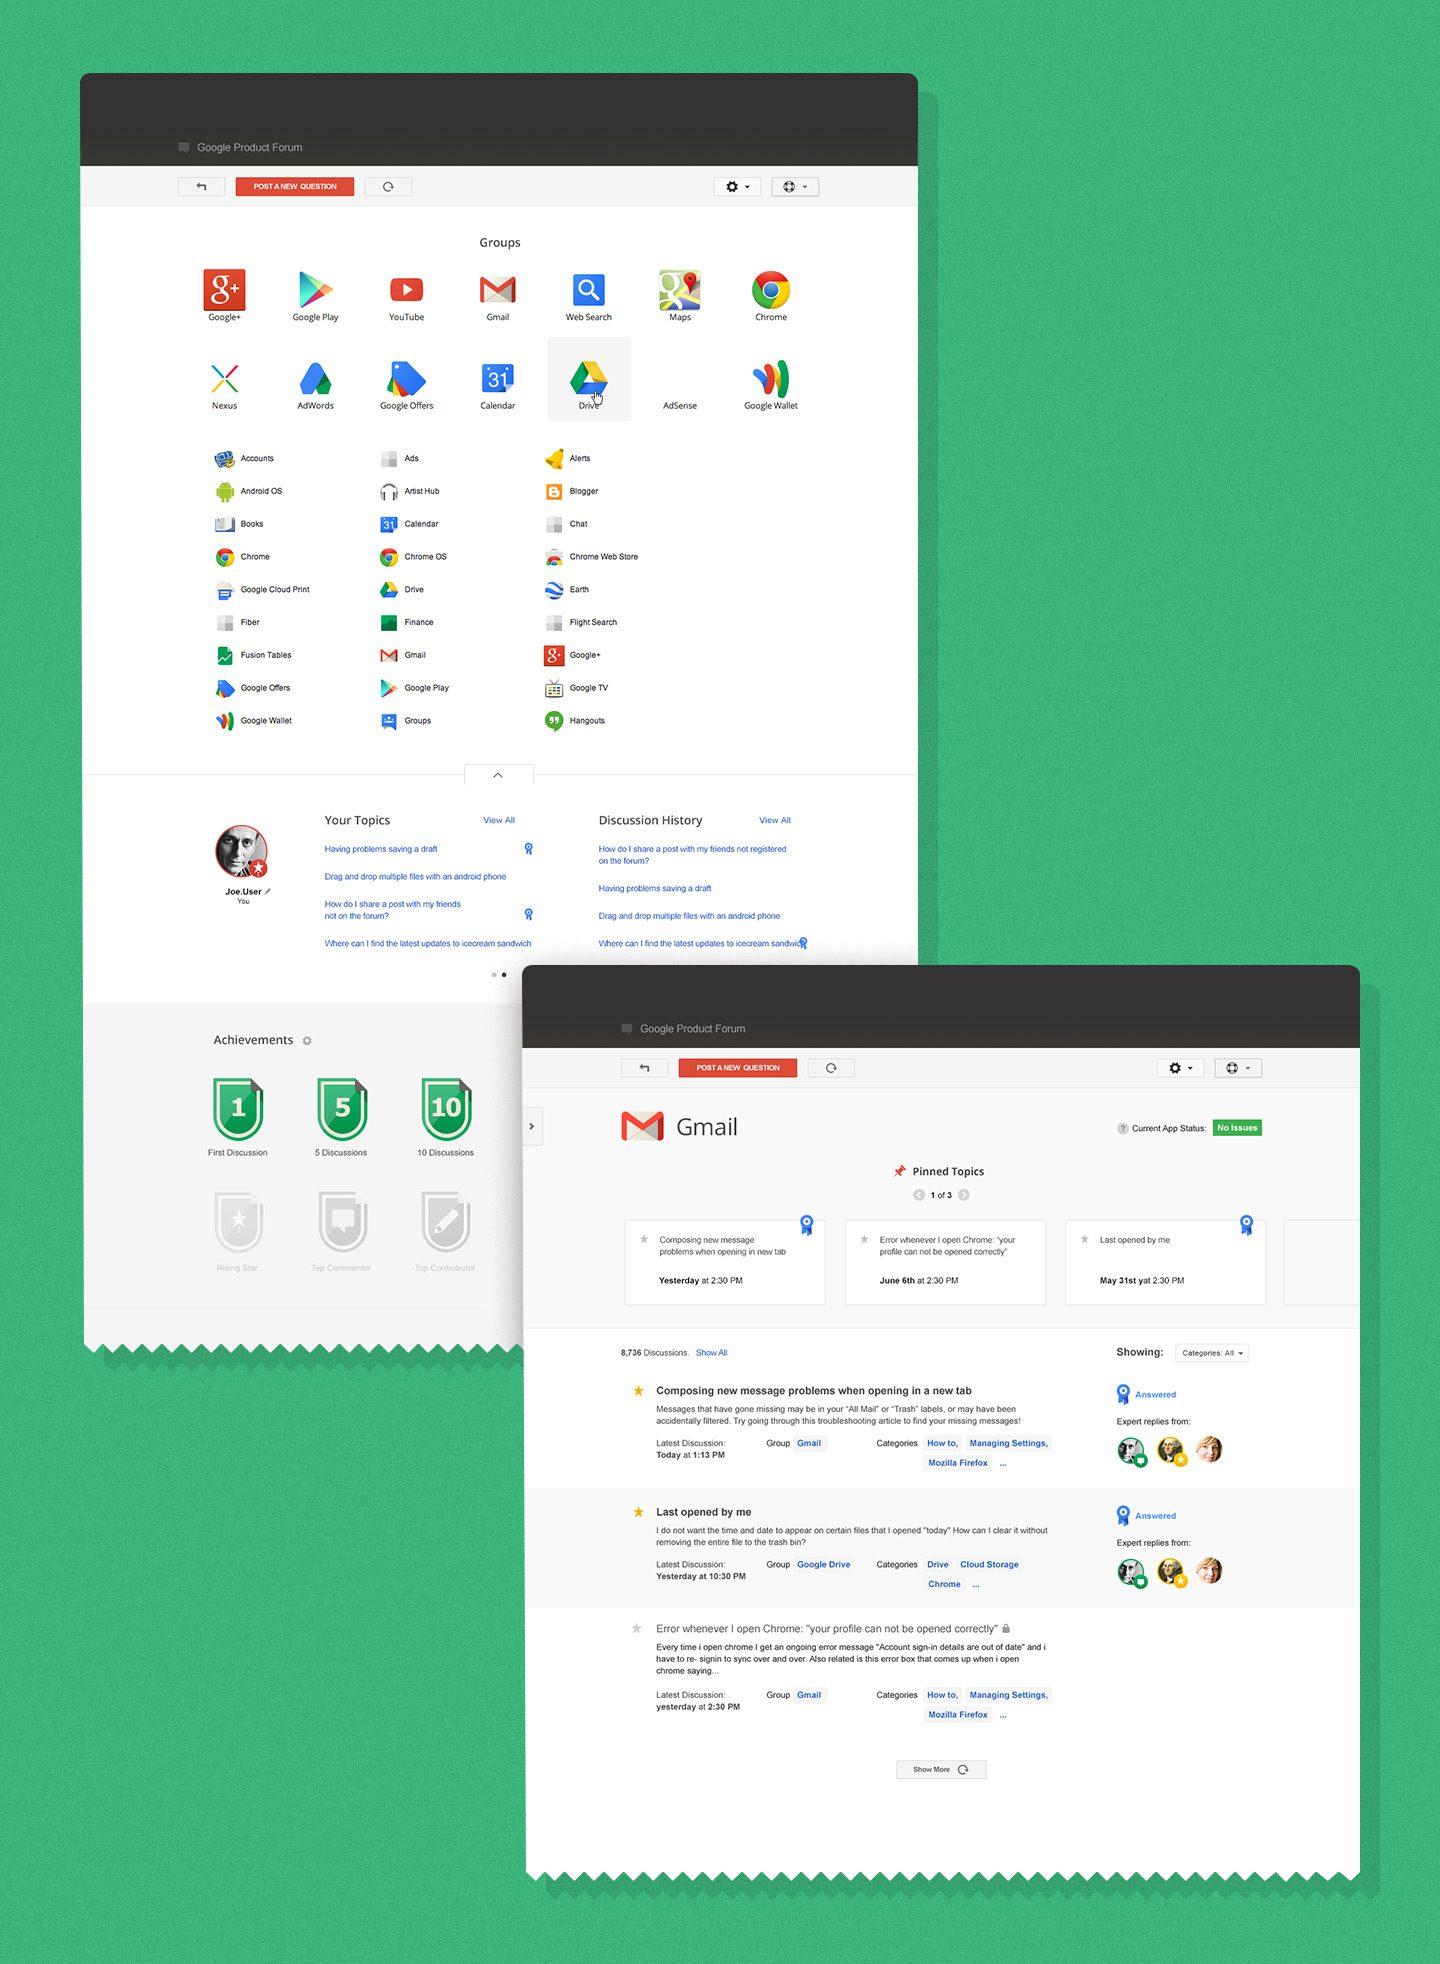 Google — Groups